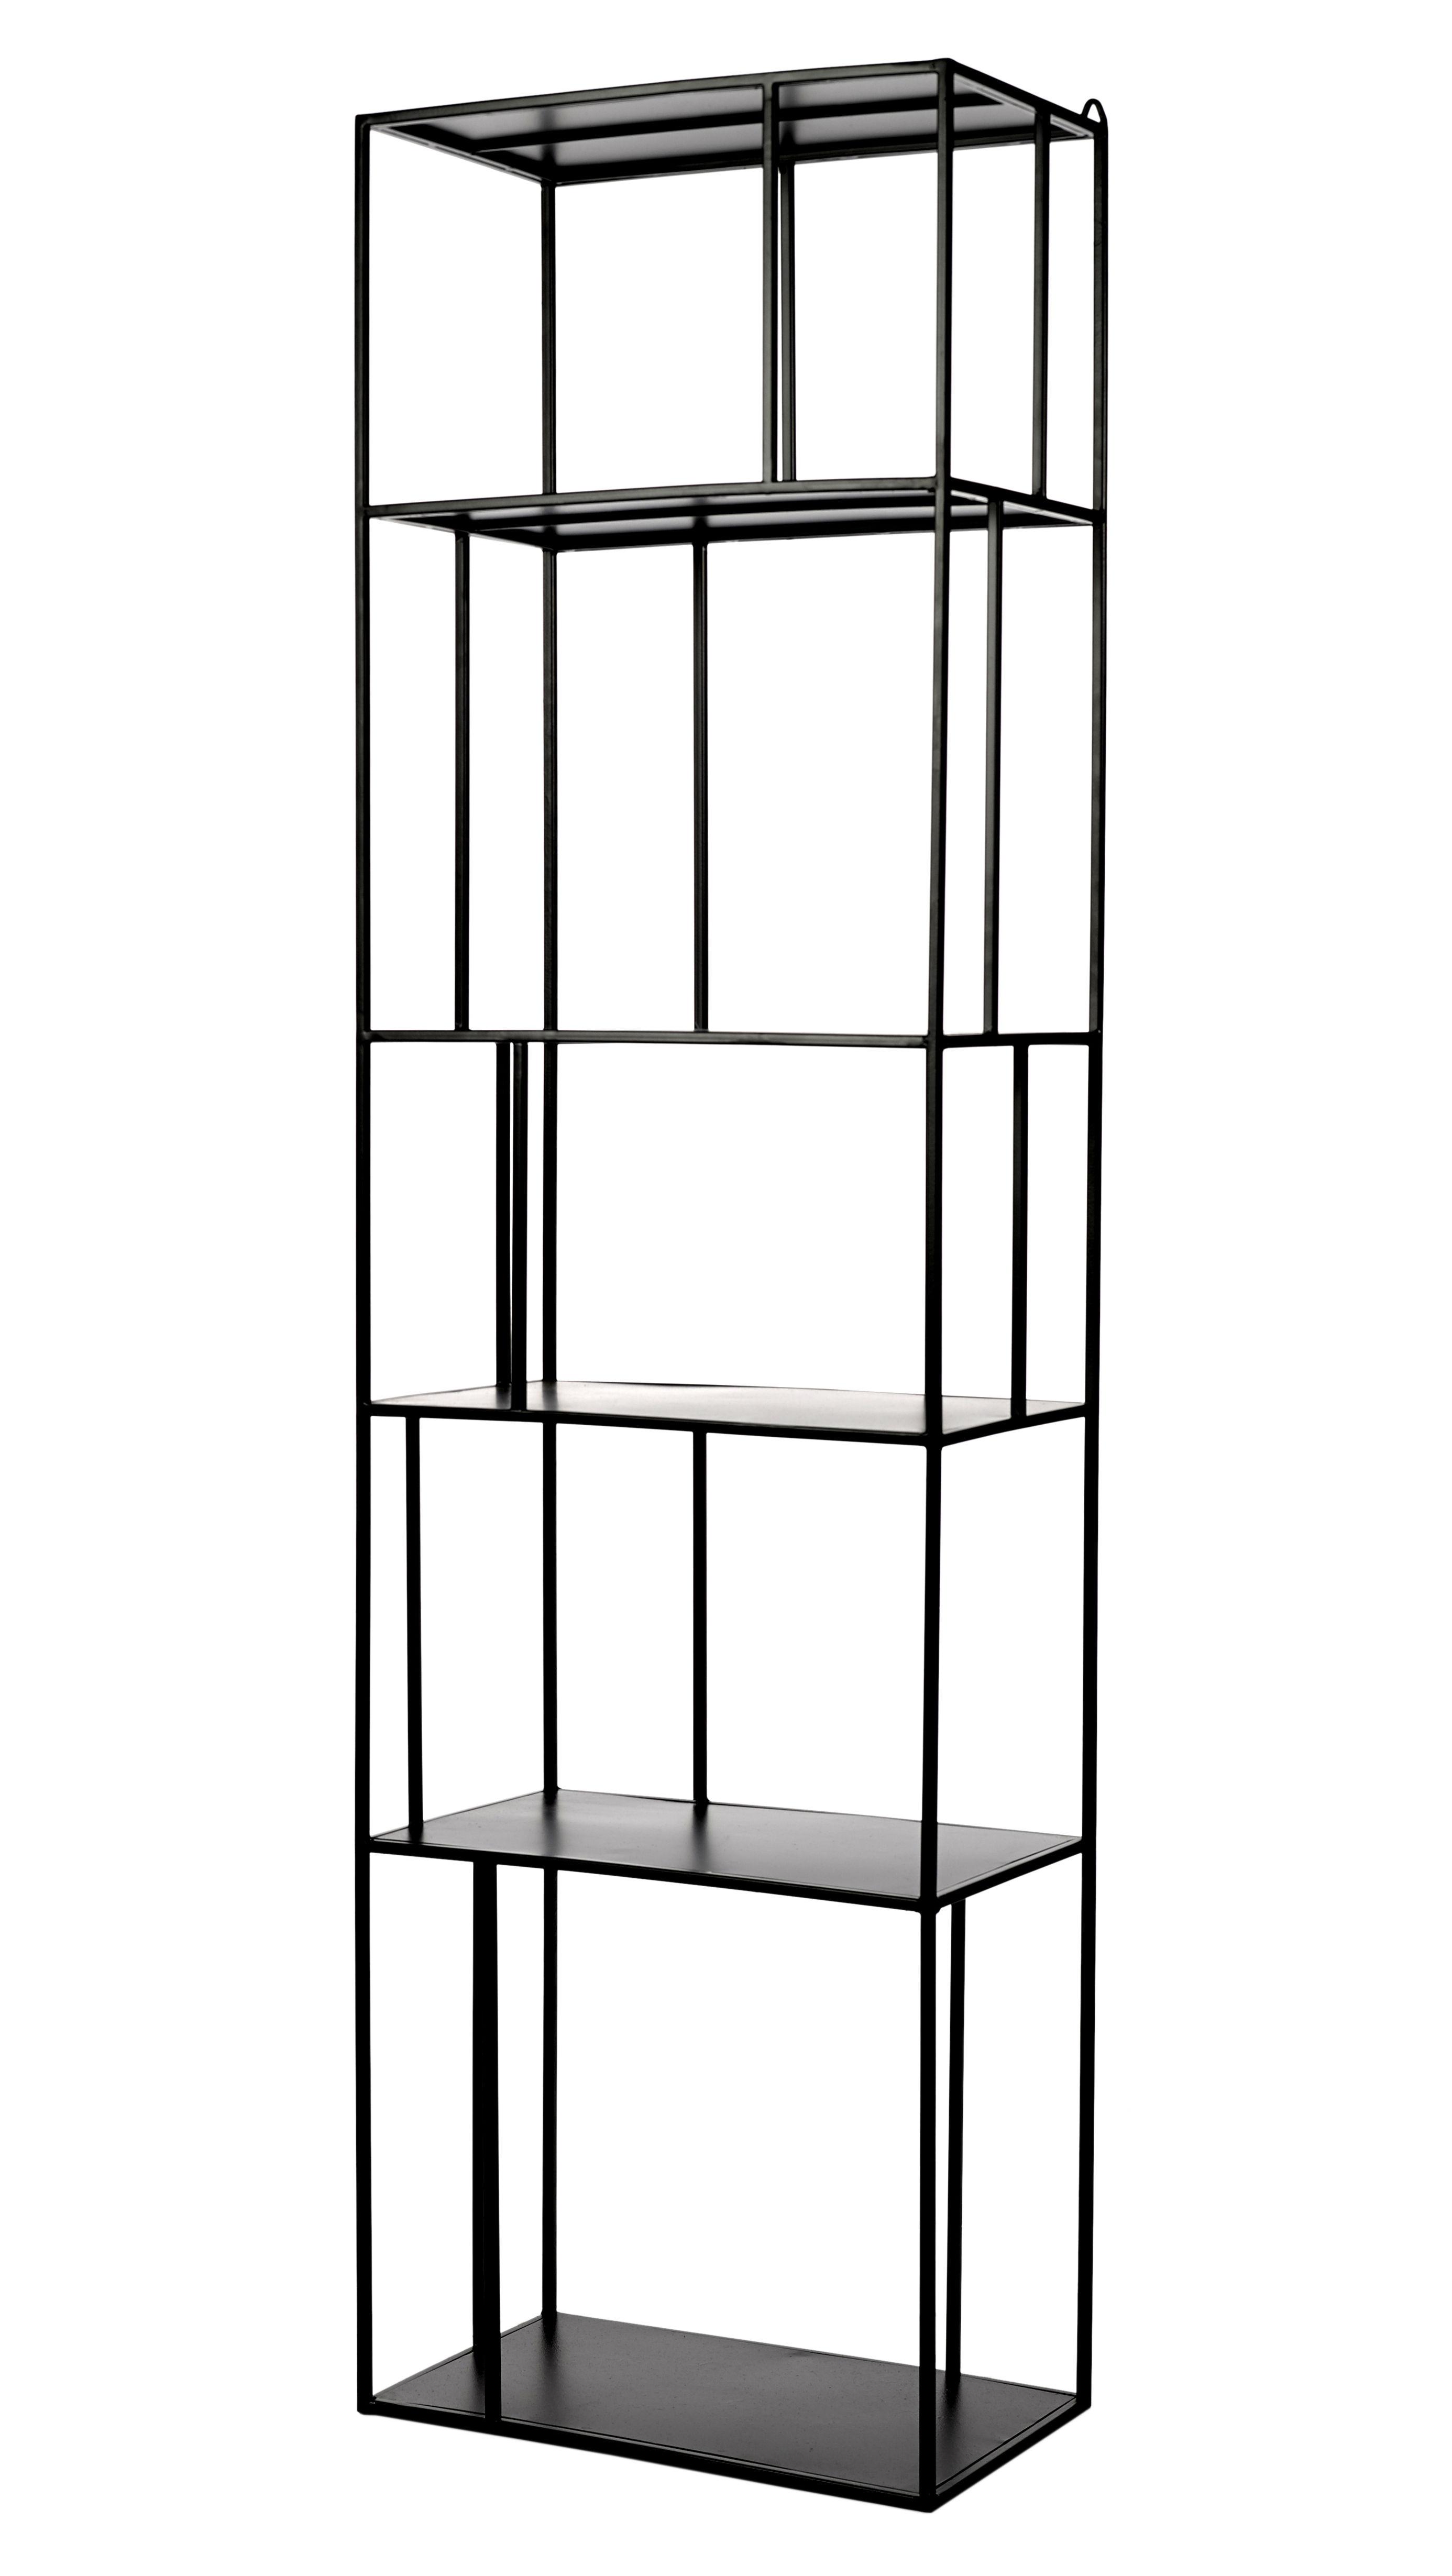 etag re metal tall single l 50 x h 179 cm l 50 cm noir pols potten. Black Bedroom Furniture Sets. Home Design Ideas